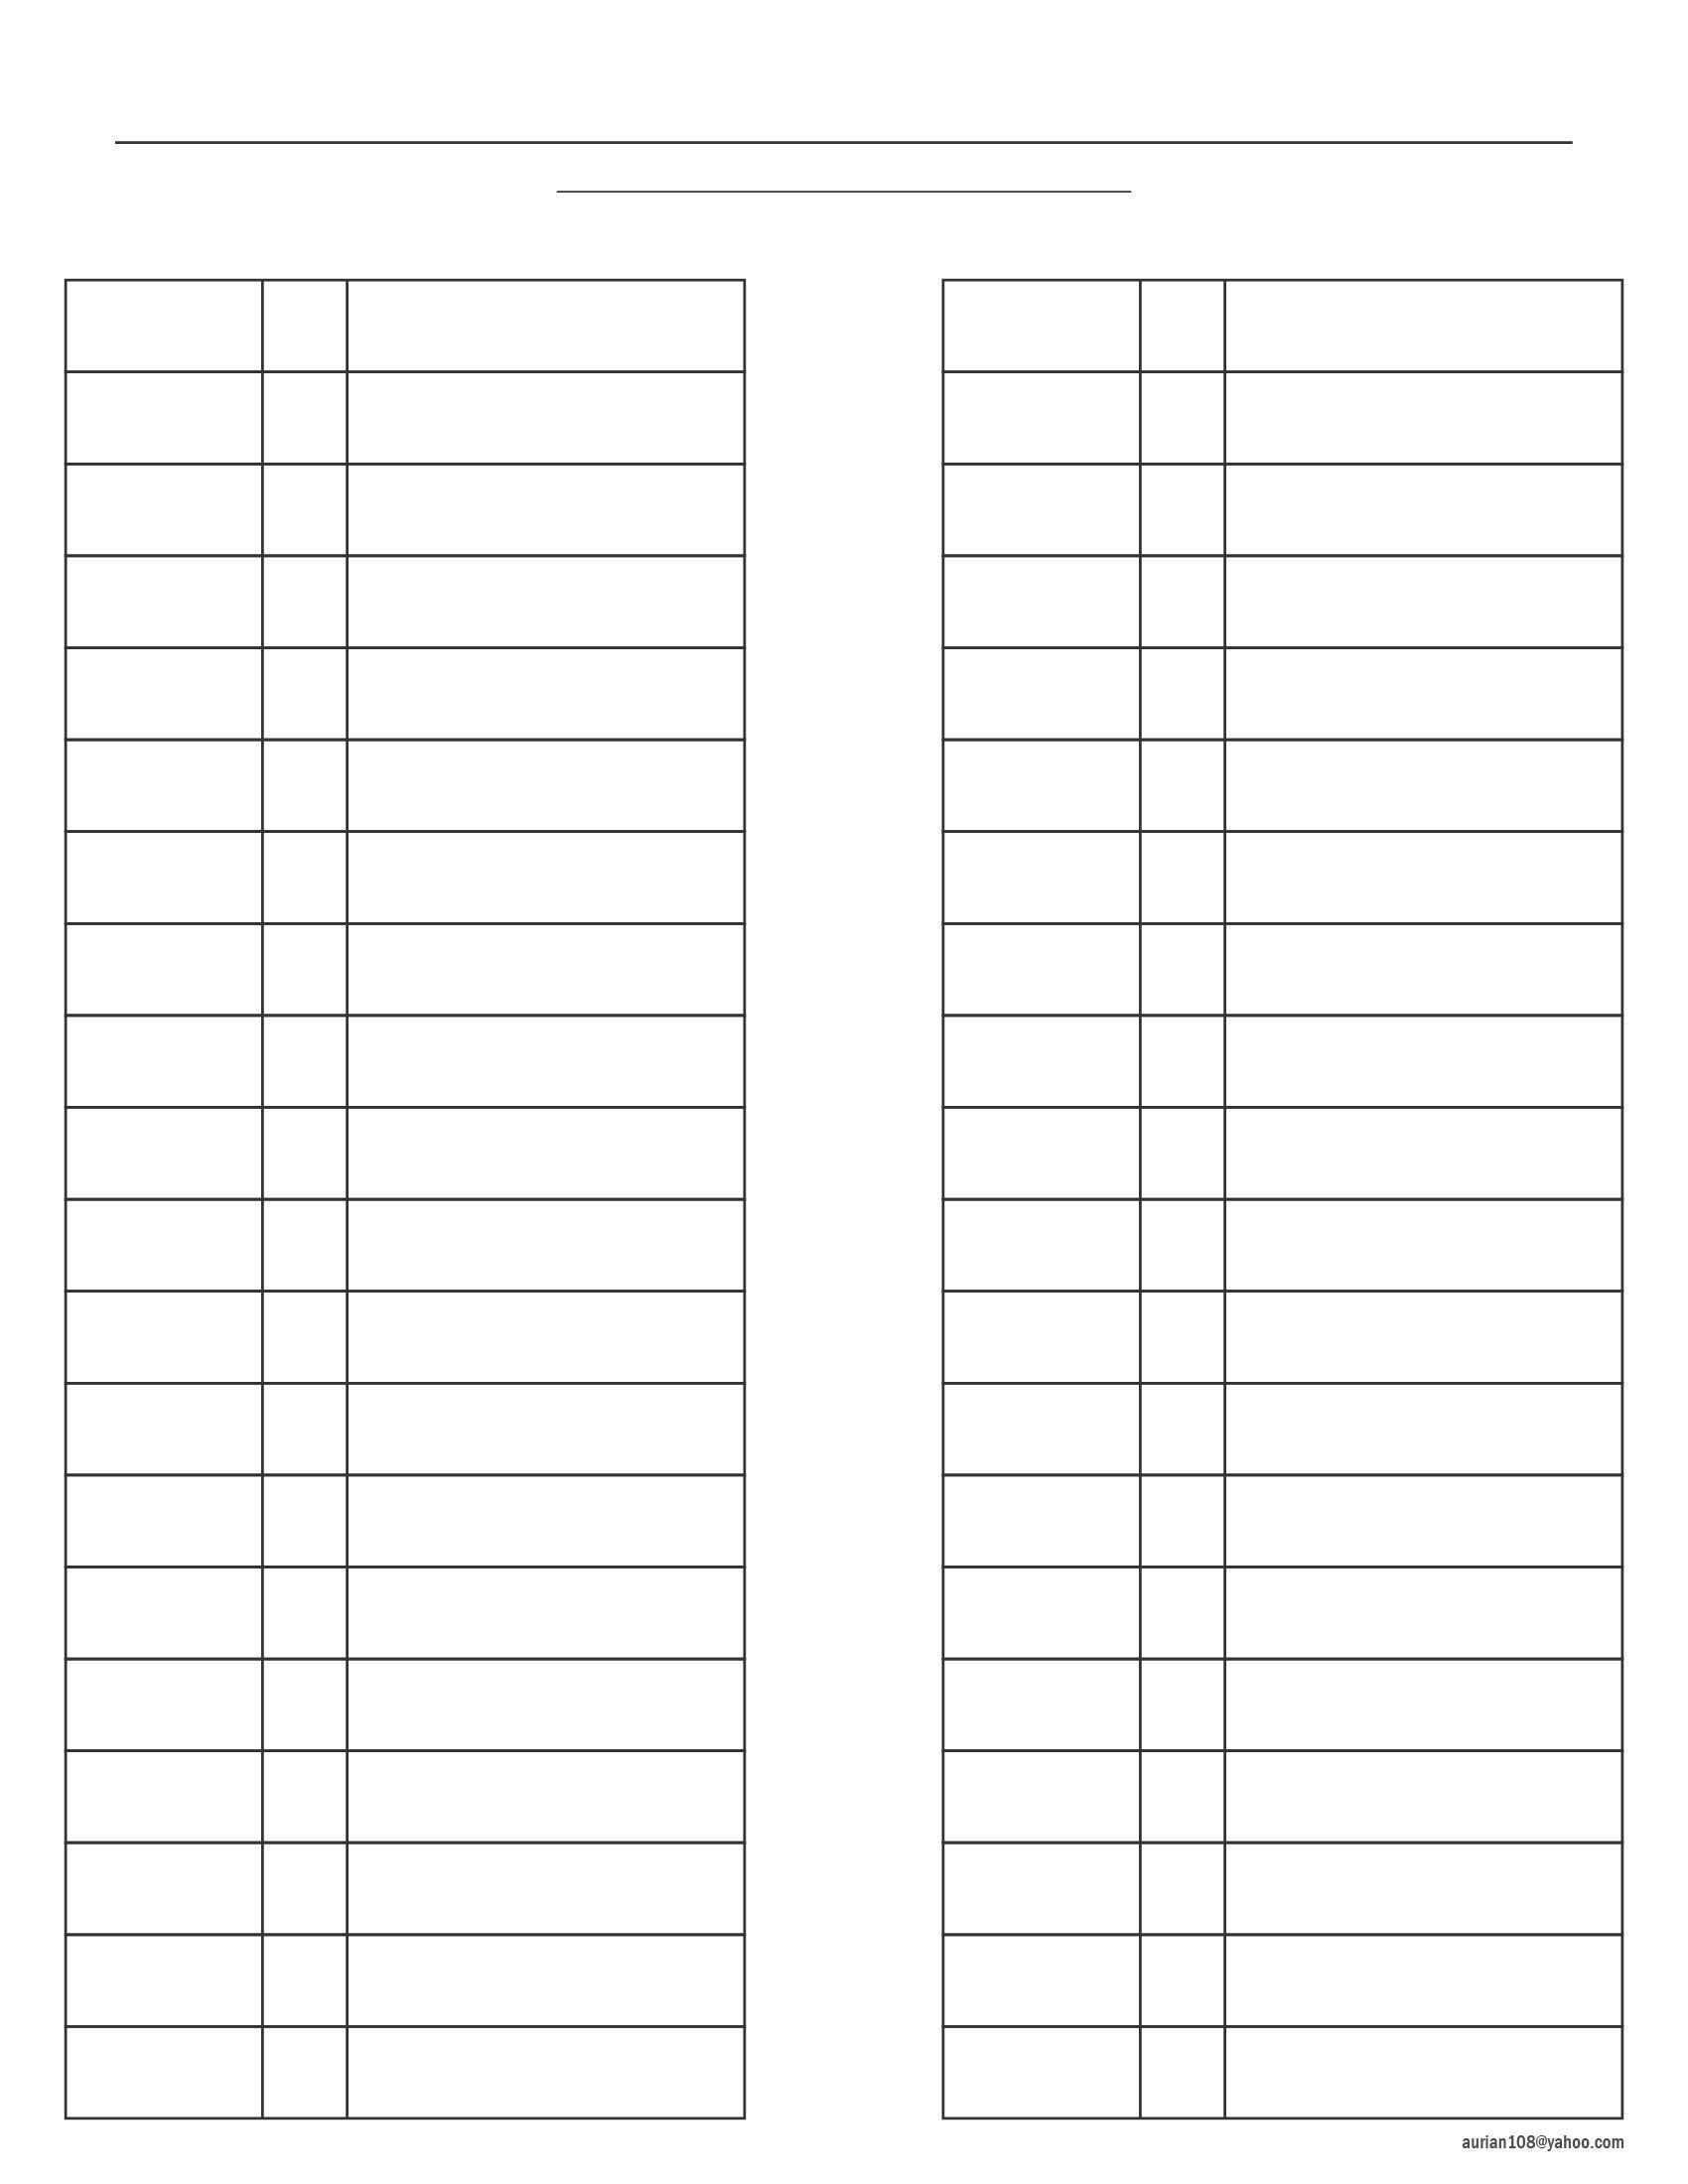 Free Blank Color Pencil Chart Color Chart Colored Pencil Techniques Color Pencil Drawing